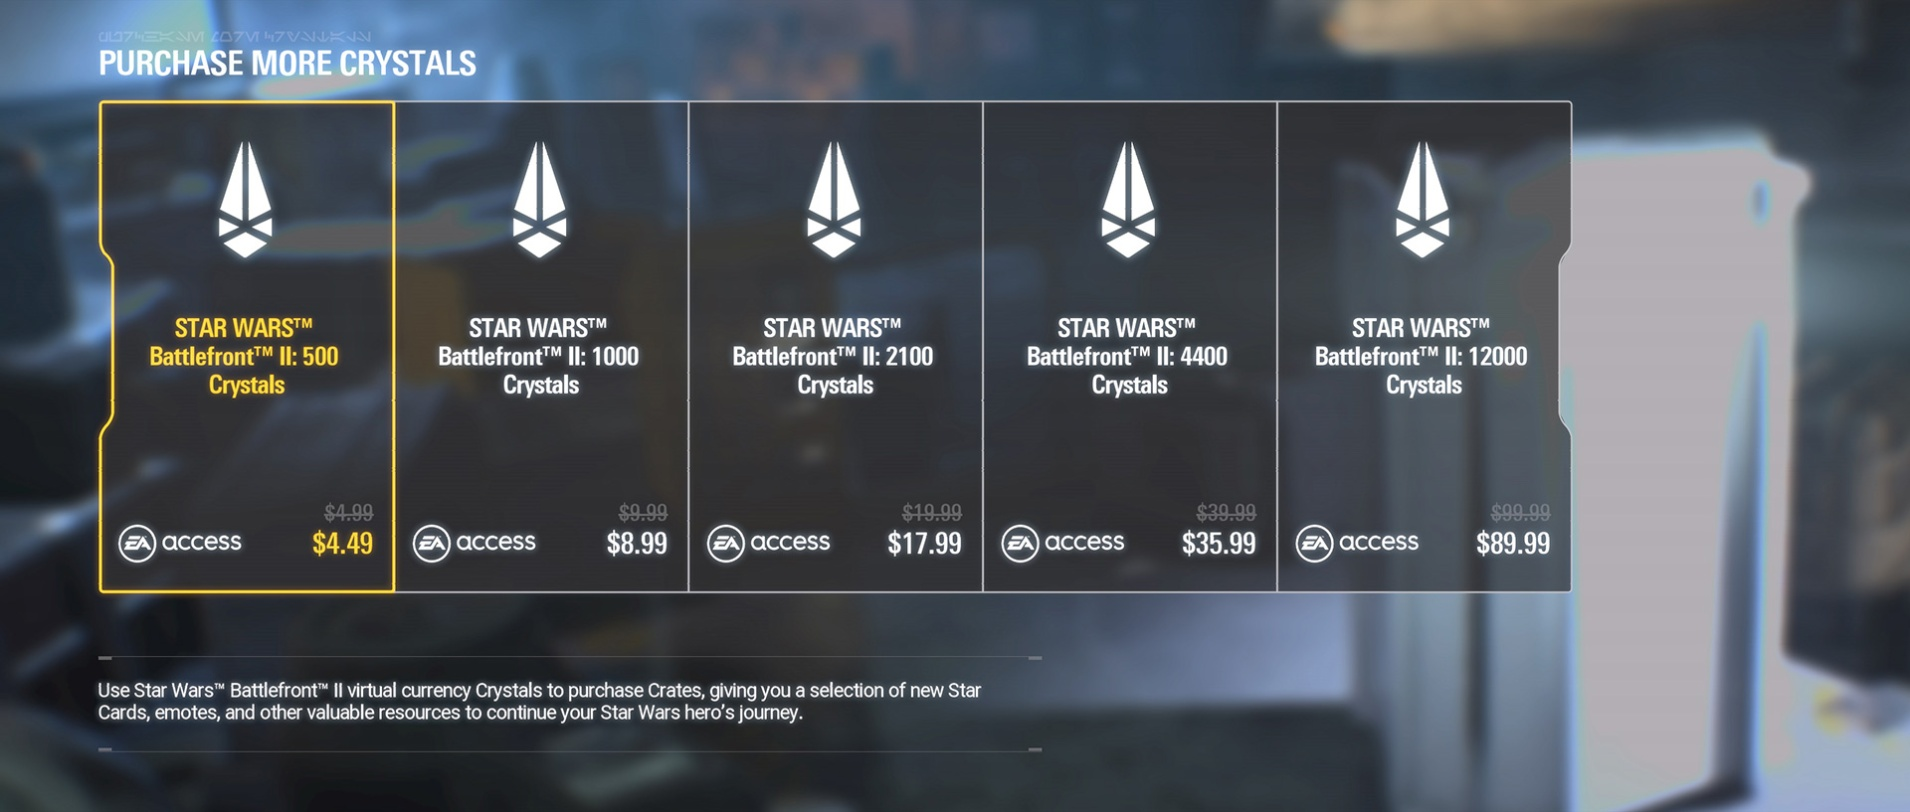 Star Wars Battlefront 2 - Loot Box (Screenshot : Ars Technica)